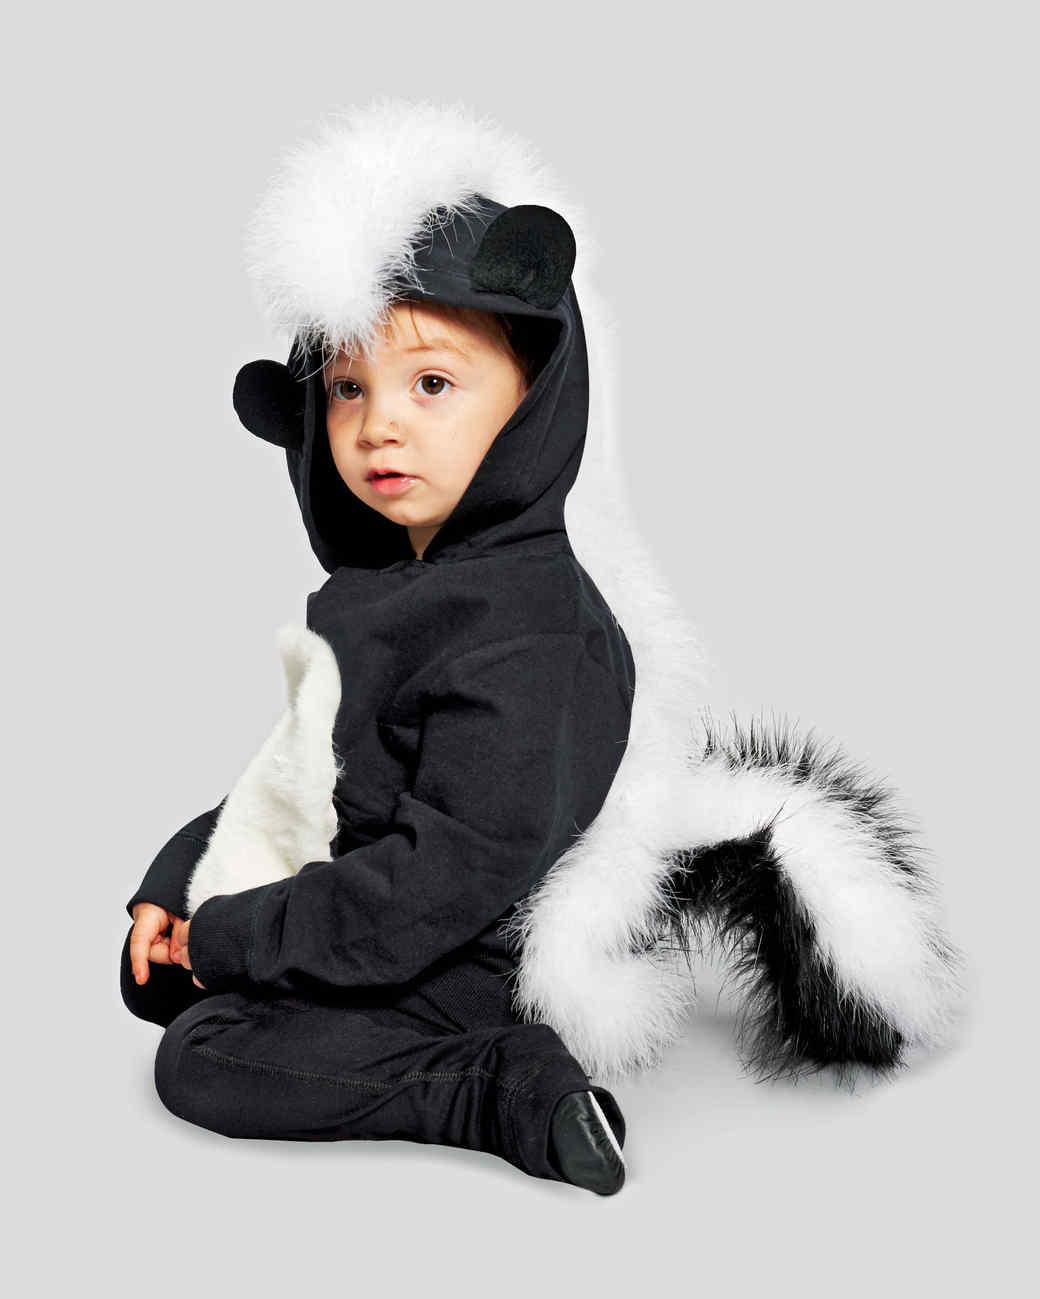 baby cow costume halloween collection baby skunk costume halloween pictures best 25 skunk - Baby Cow Costume Halloween